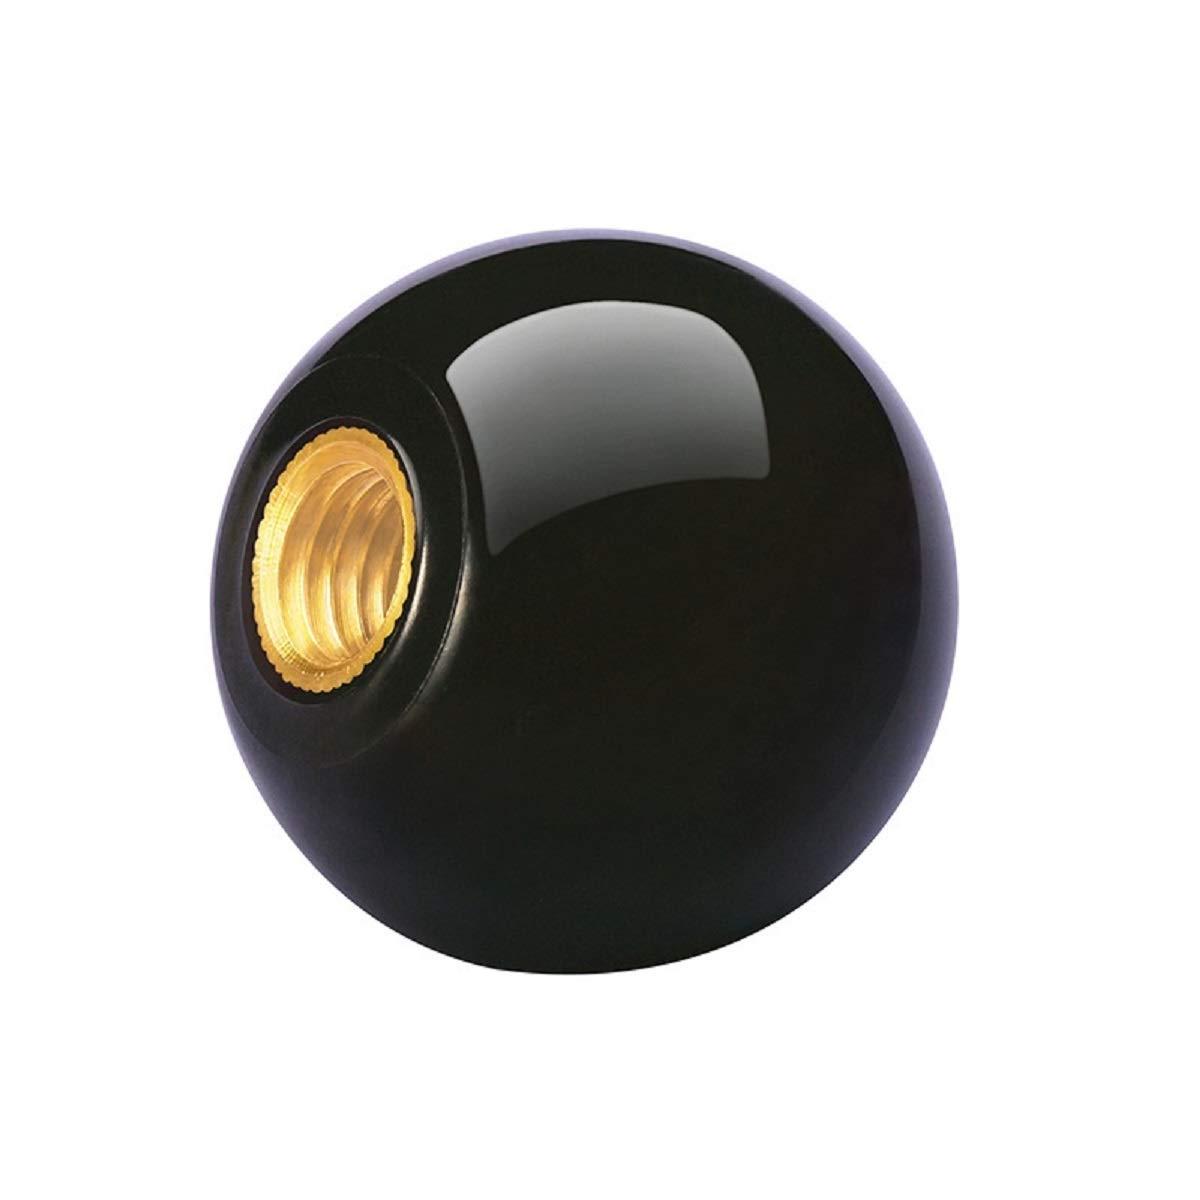 M8x30 Bakelite Ball Knob Ball Handle with M5 M6 M8 M10 M12 M16 Female Thread Brass Insert 1pcs